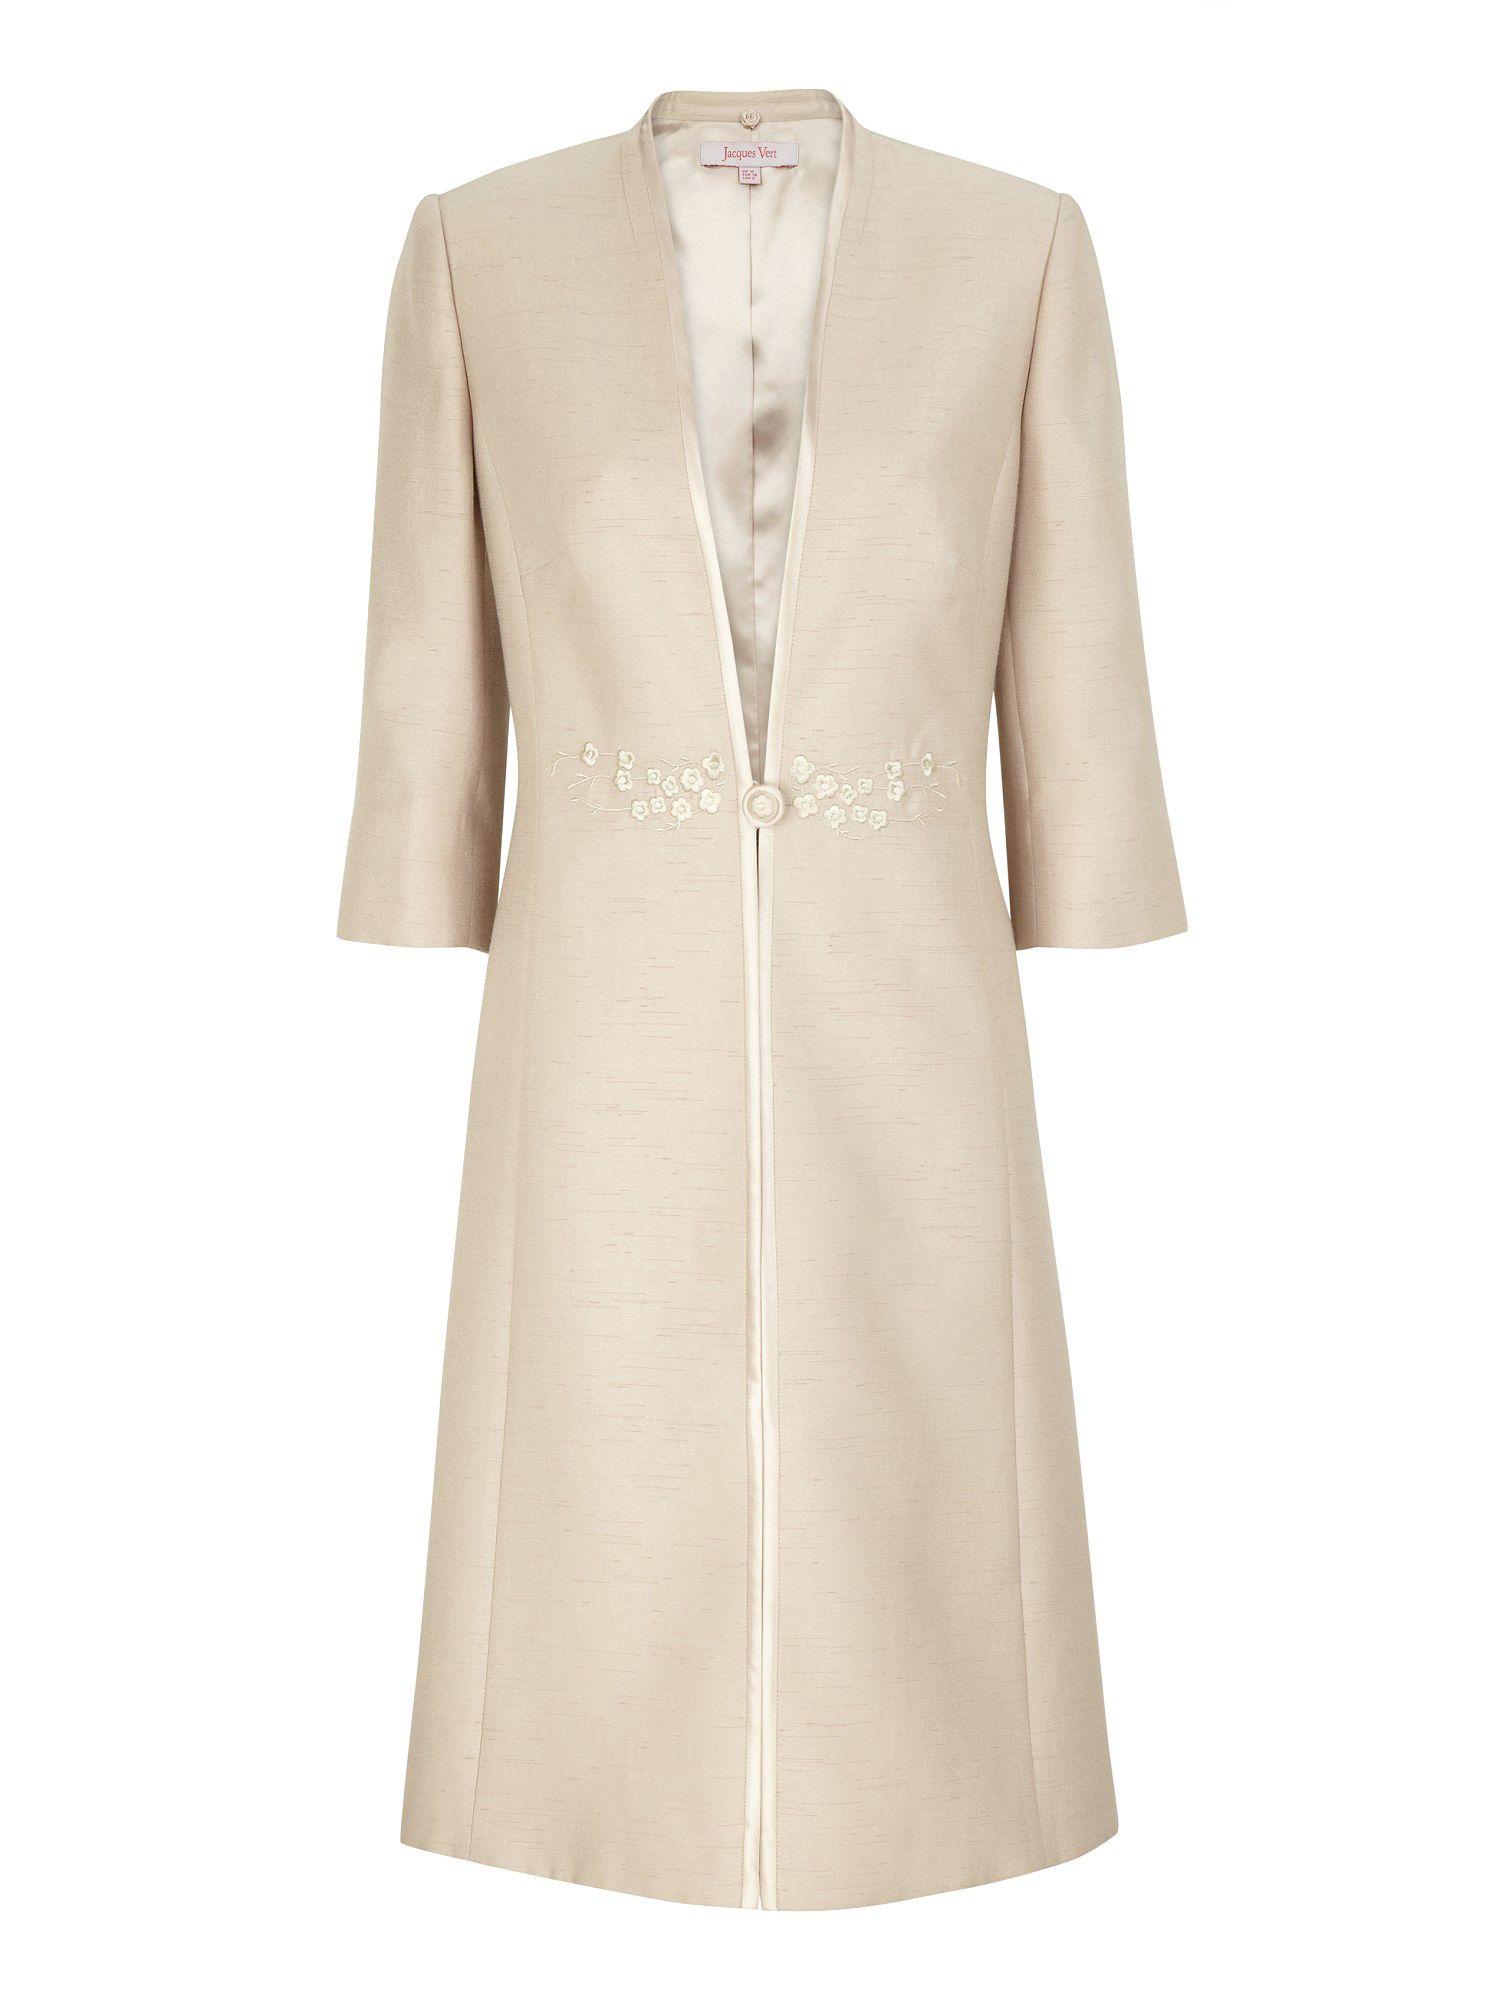 Jacques Vert Sandstone Dress Coat in Beige (cream) | Lyst Victoria Beckham Dresses